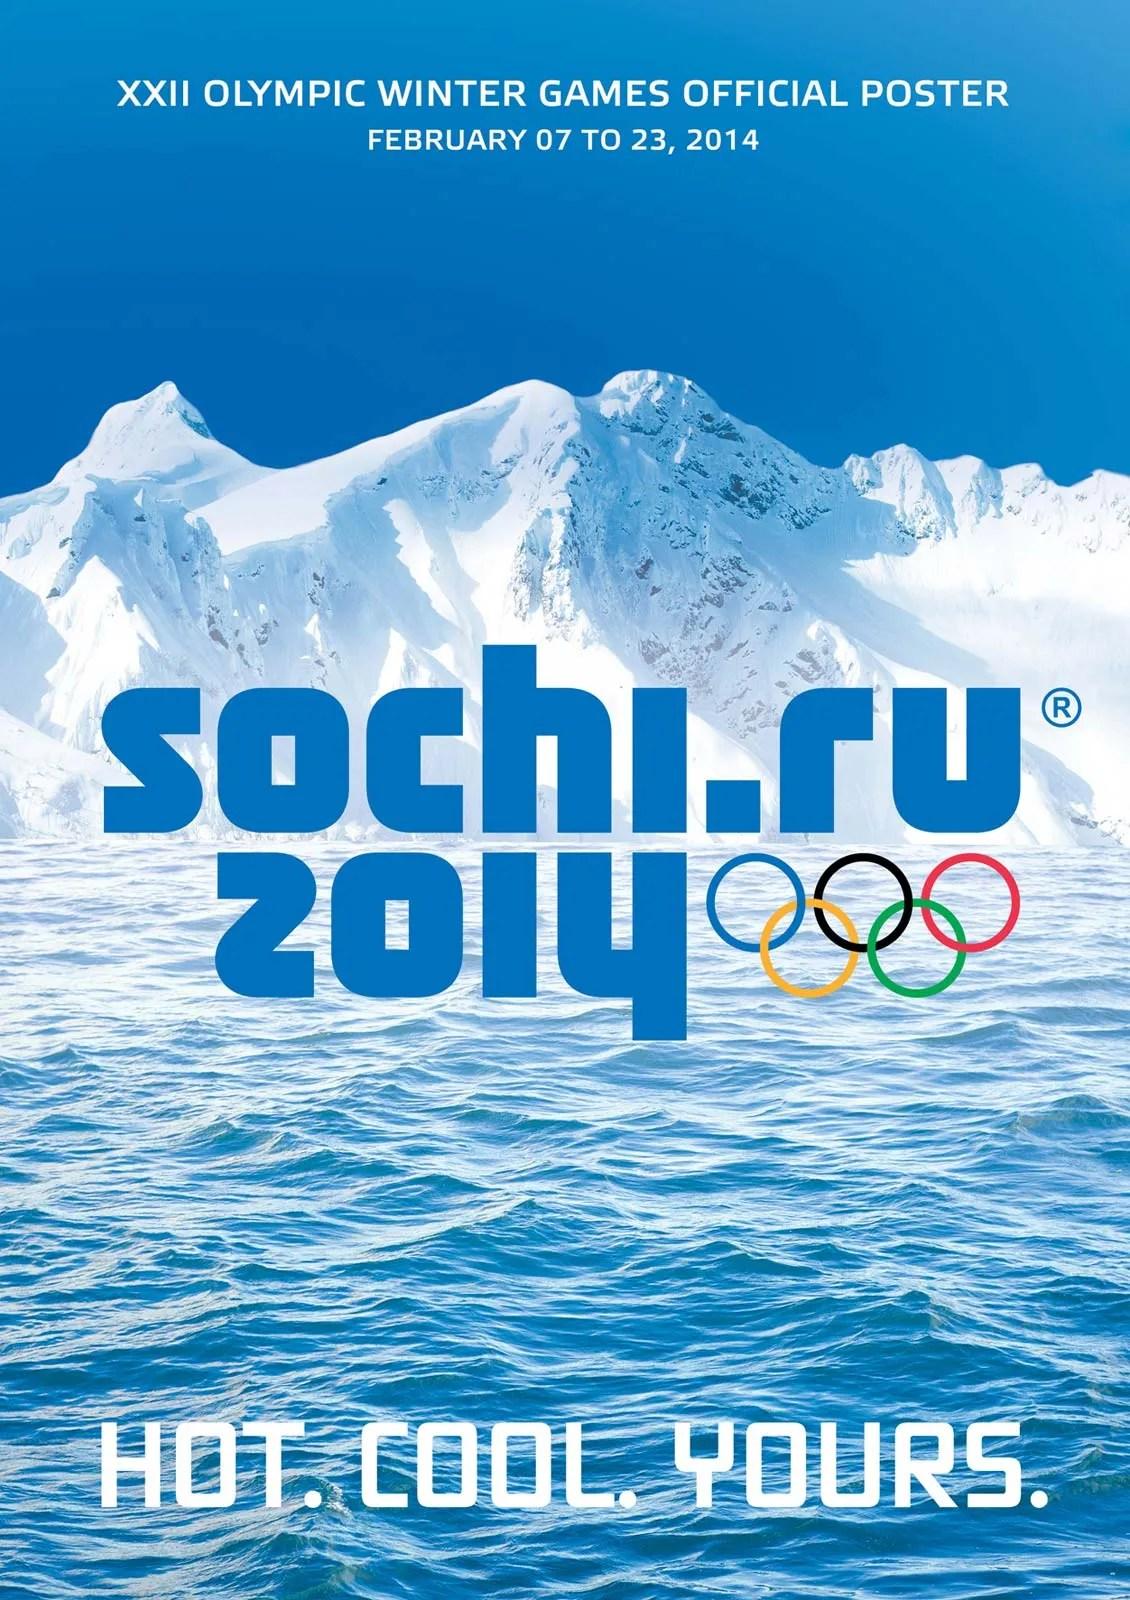 Sochi Olympic Winter Games